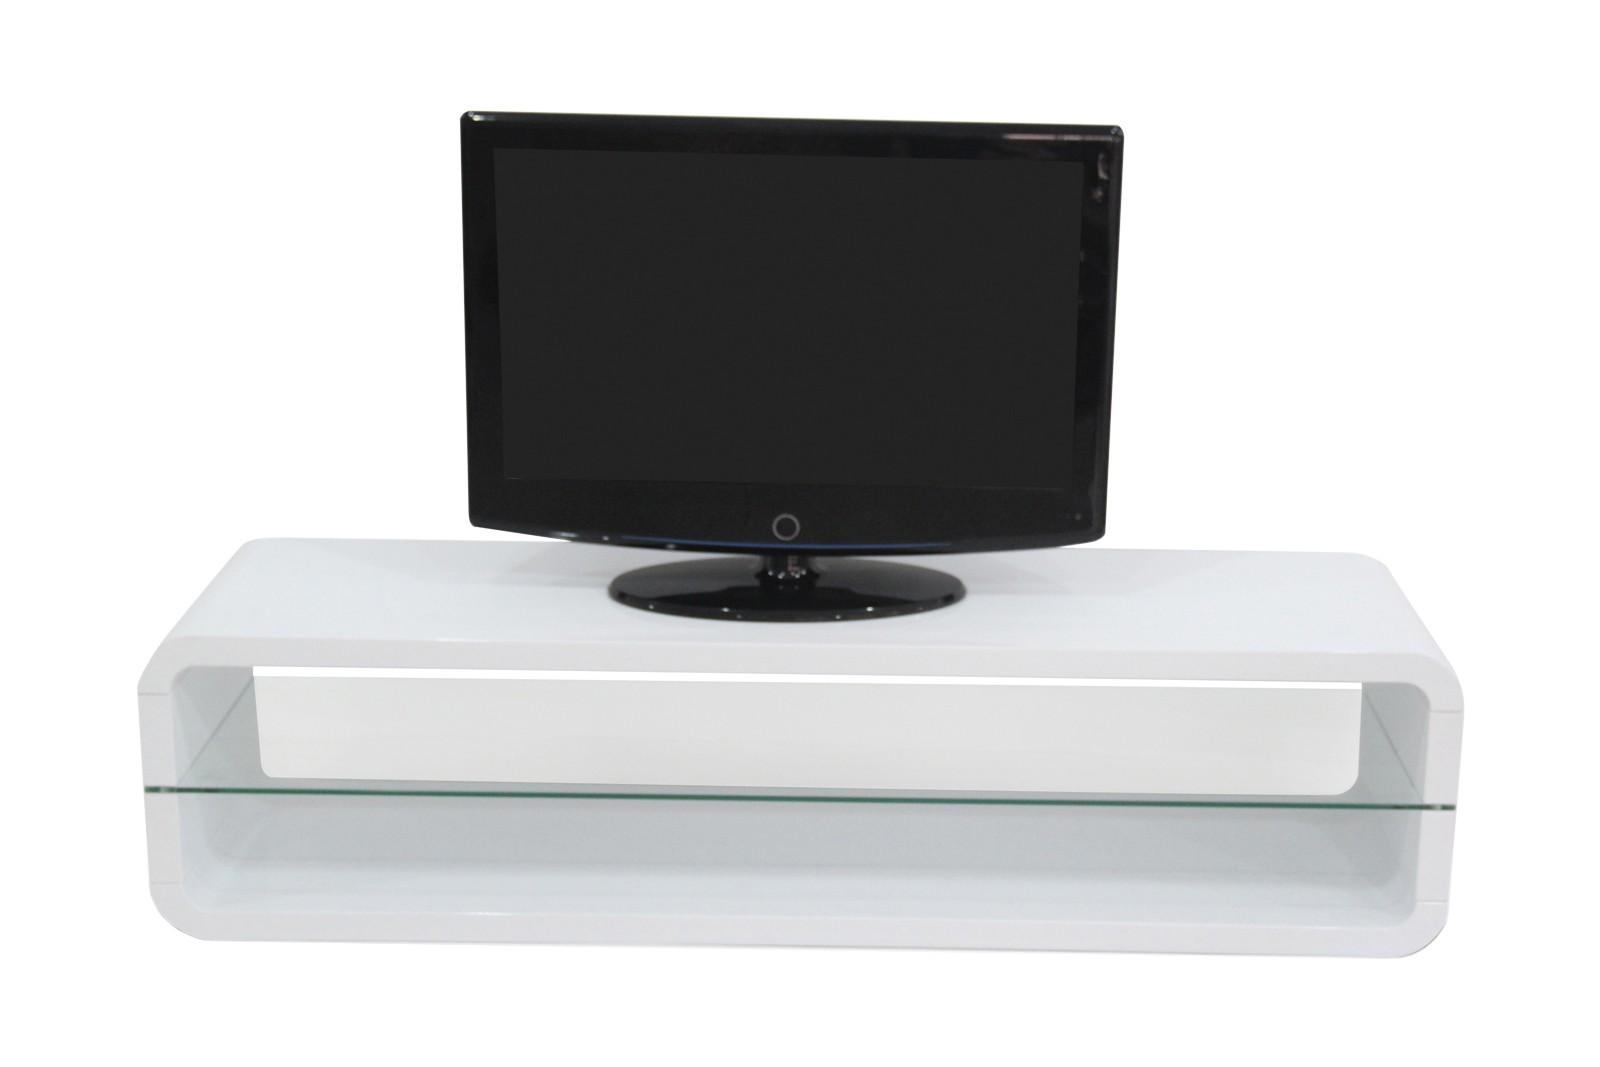 Hoogglans Wit Kast : Tv meubel wit hoogglans aktie wonen.nl